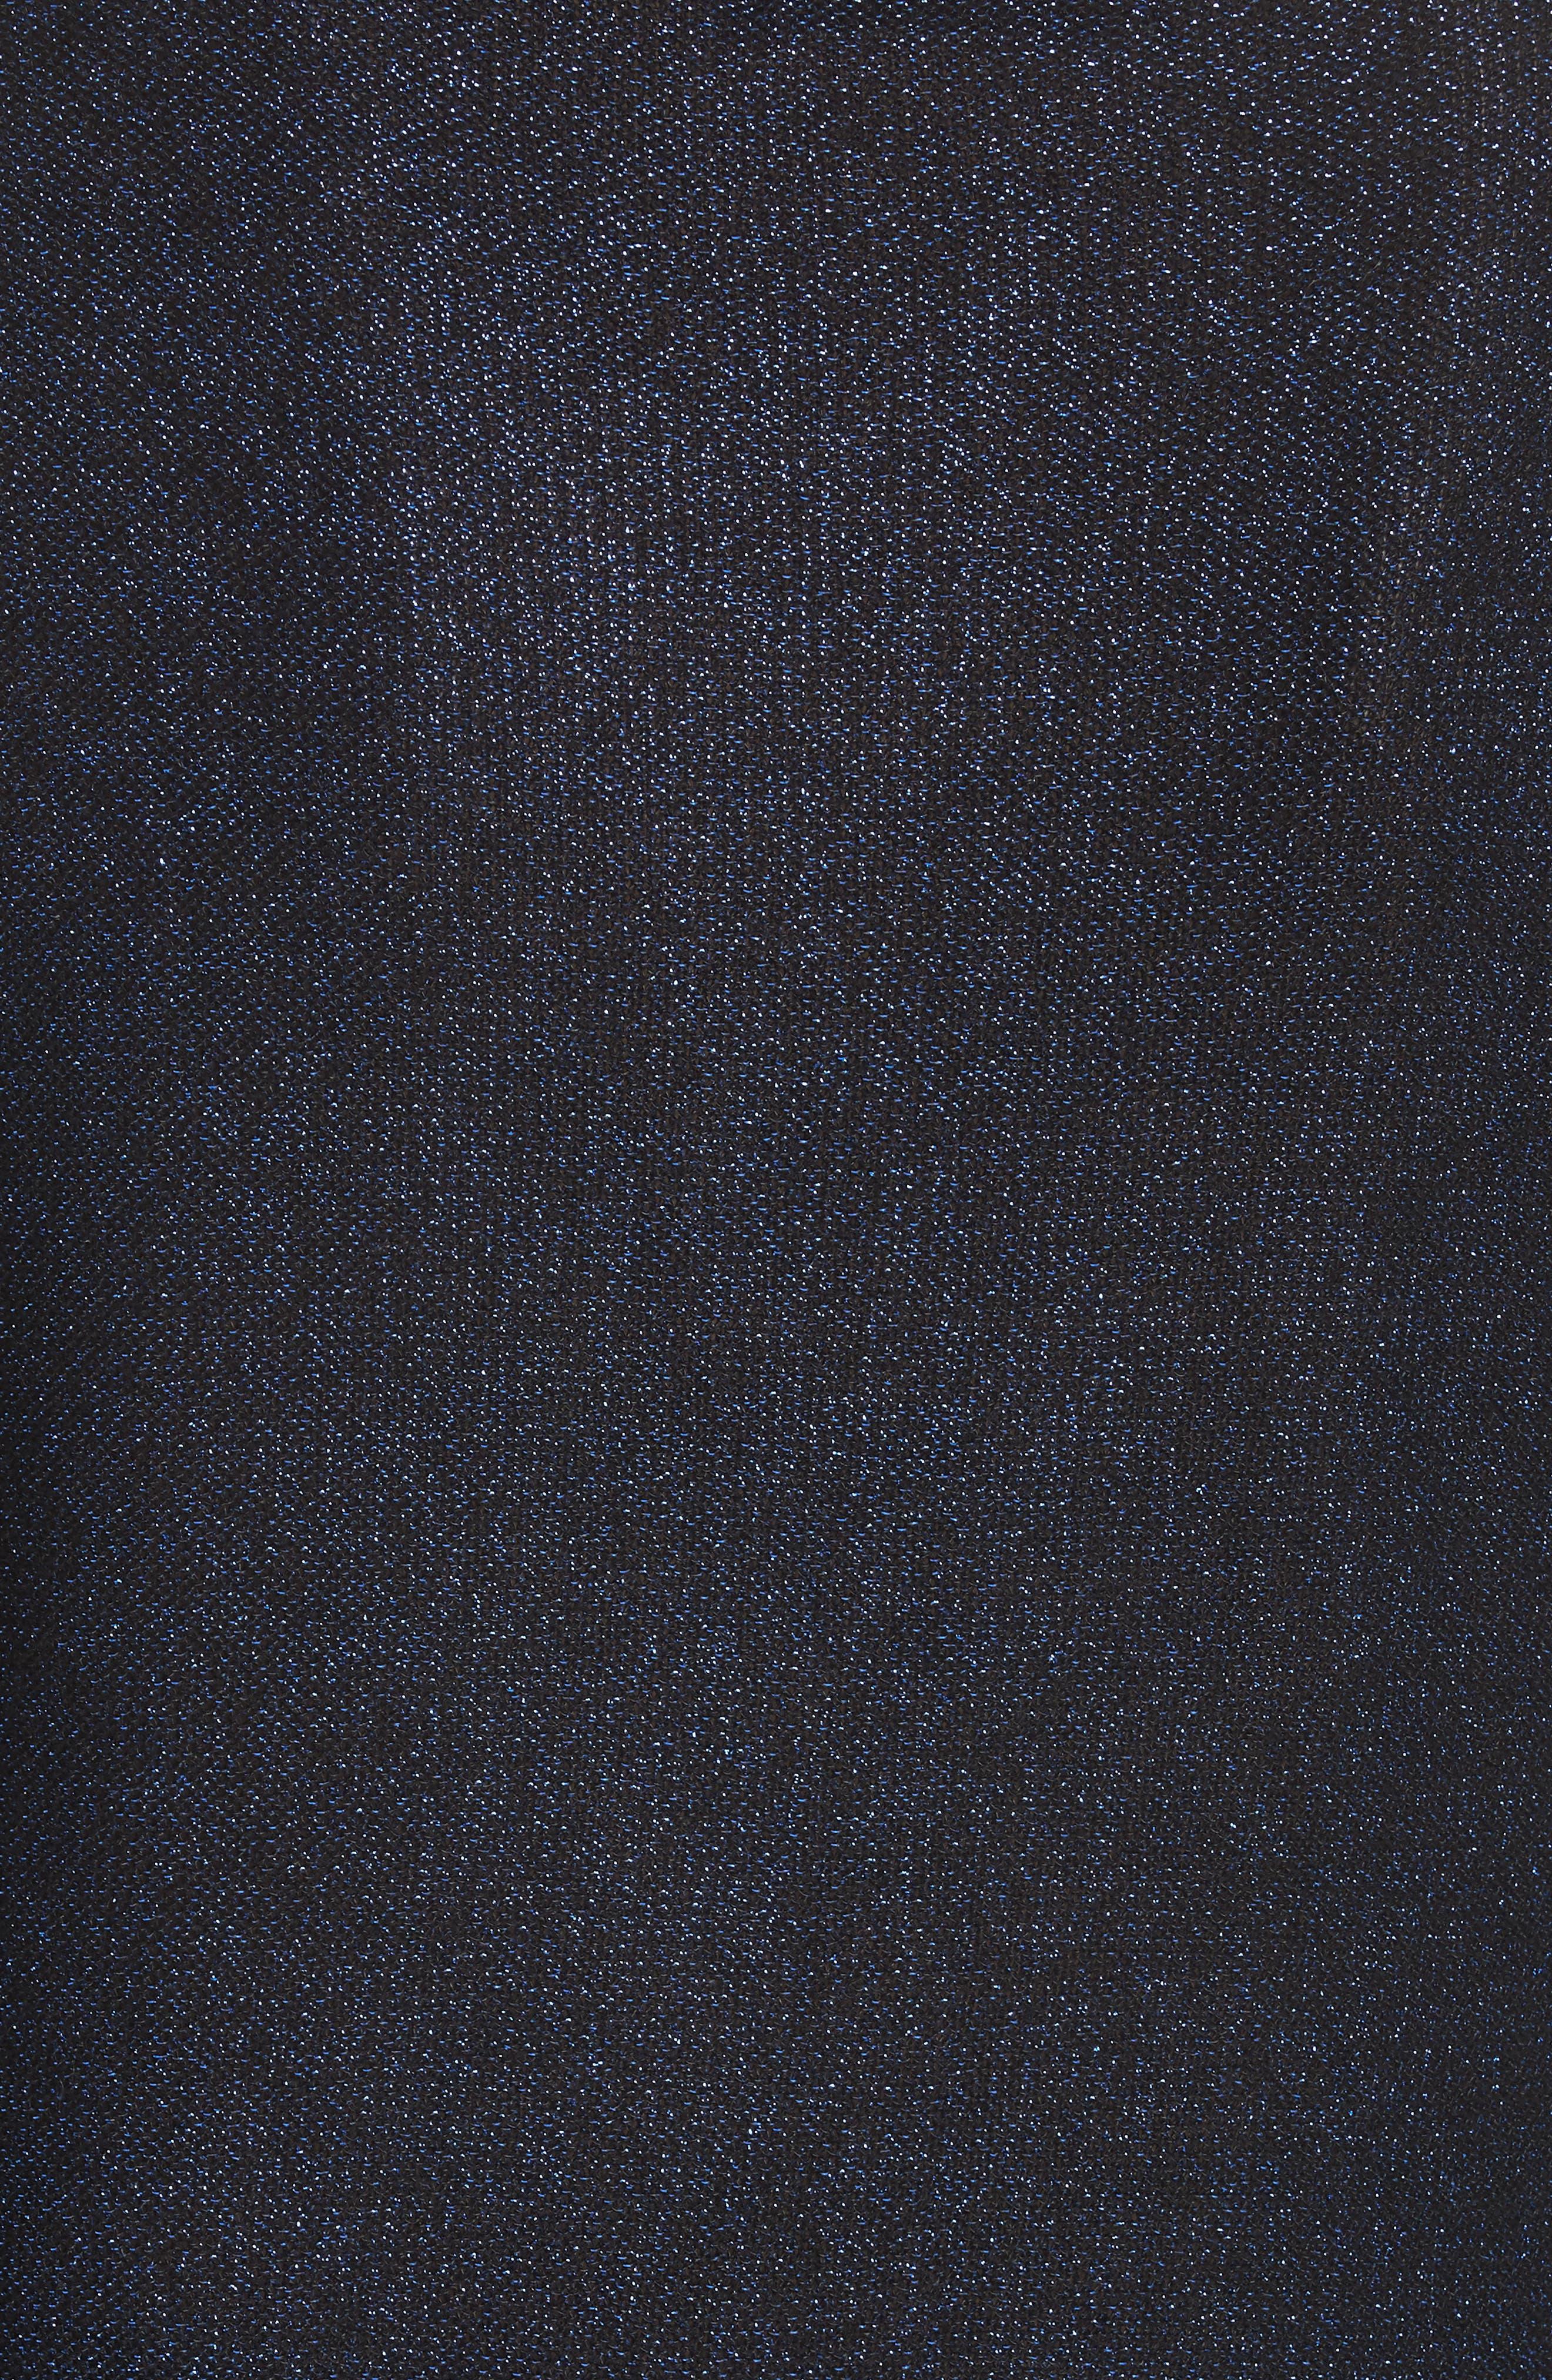 Metallic Shimmer Cotton Blend Sweater,                             Alternate thumbnail 5, color,                             430